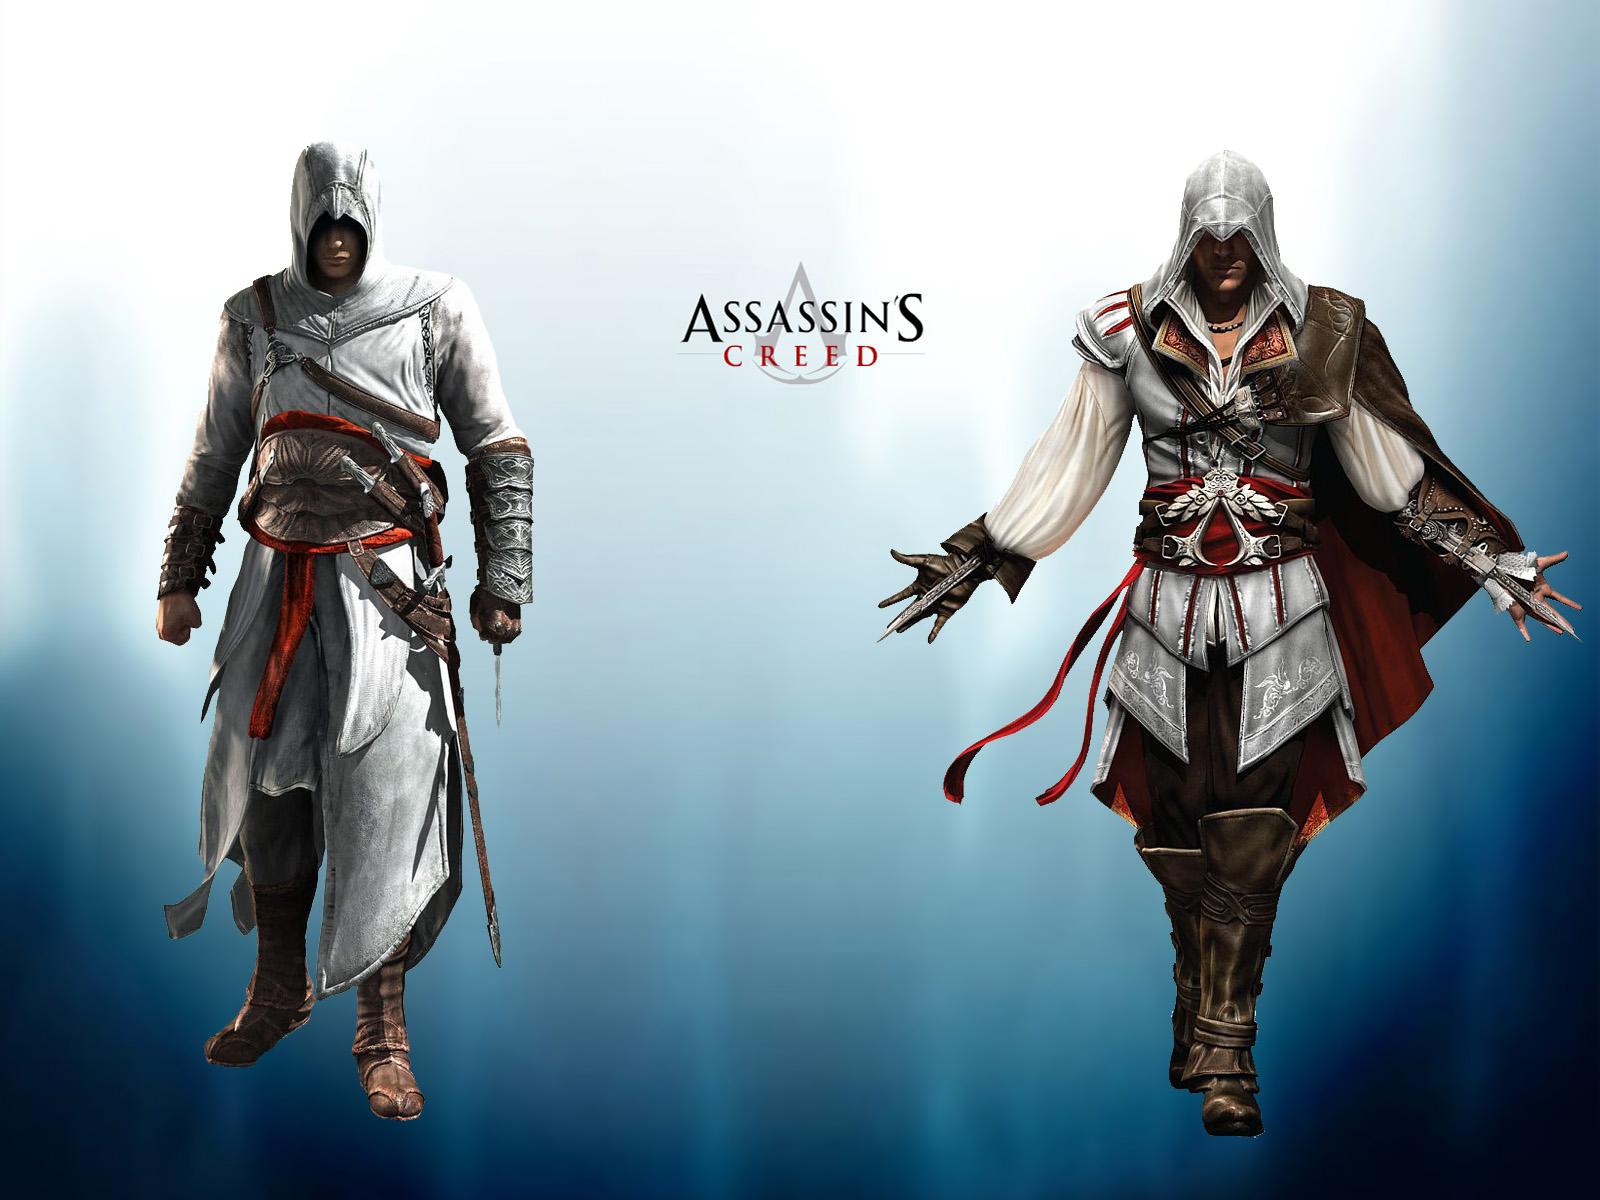 http://2.bp.blogspot.com/-kvY-gxwFNps/TZi9T08OUvI/AAAAAAAAAIk/9sieL2x8oO4/s1600/Altair_and_Ezio_by_DarkEspada.jpg